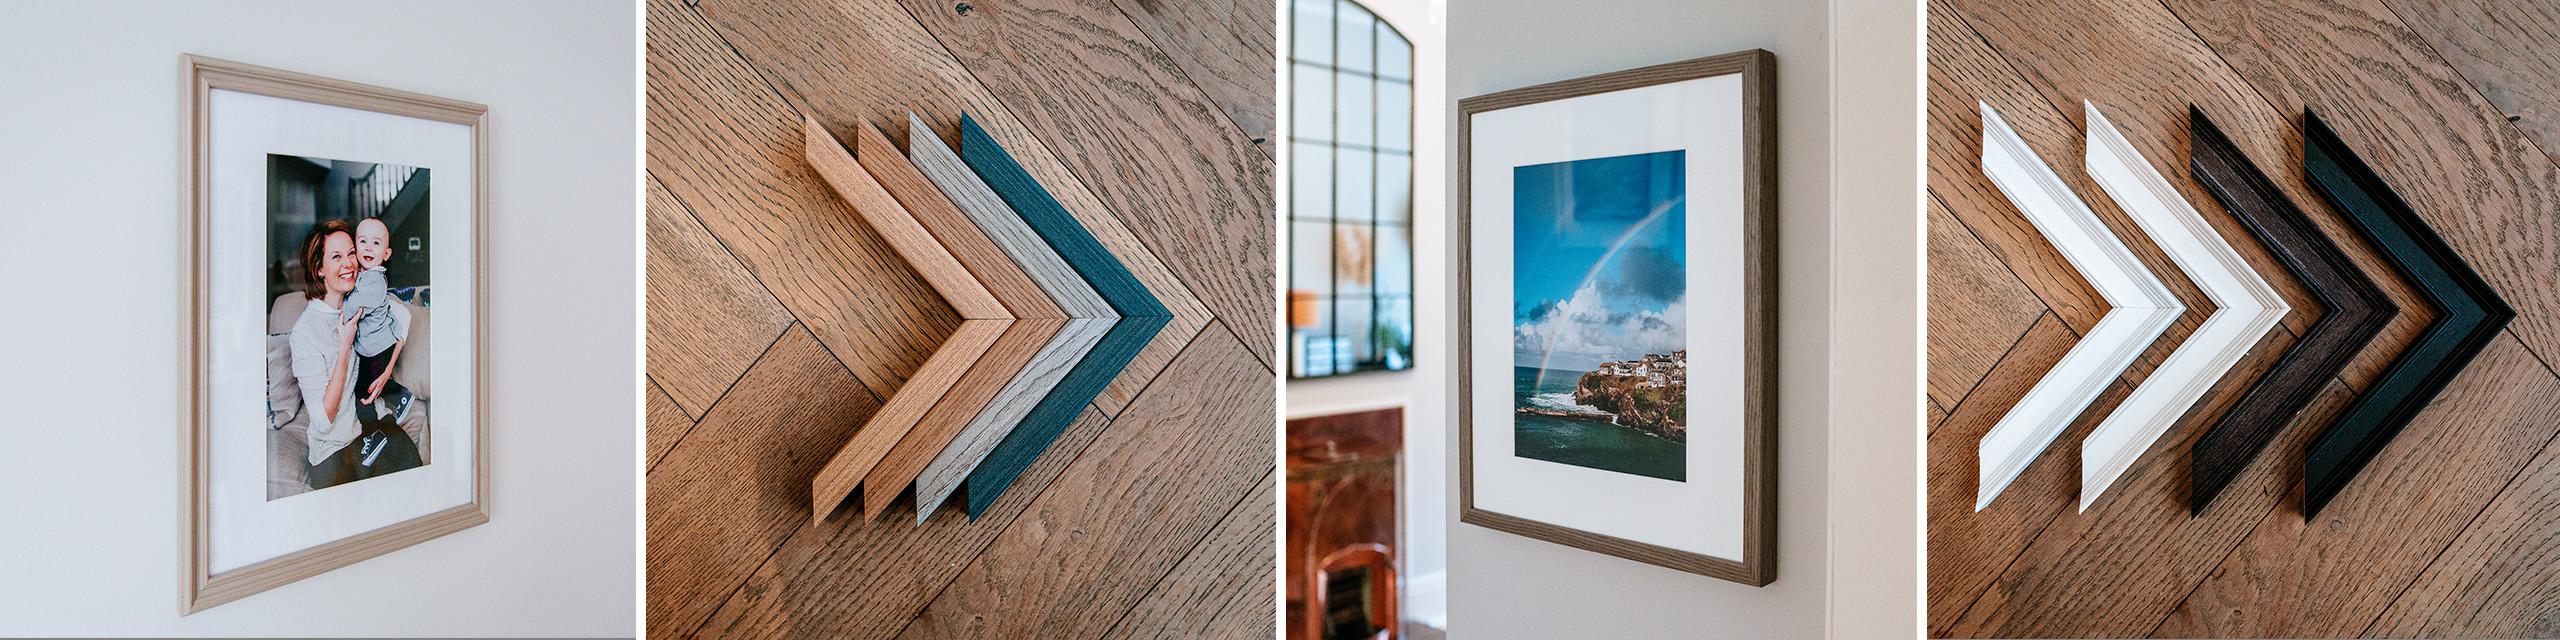 Surrey wedding photographer frame samples